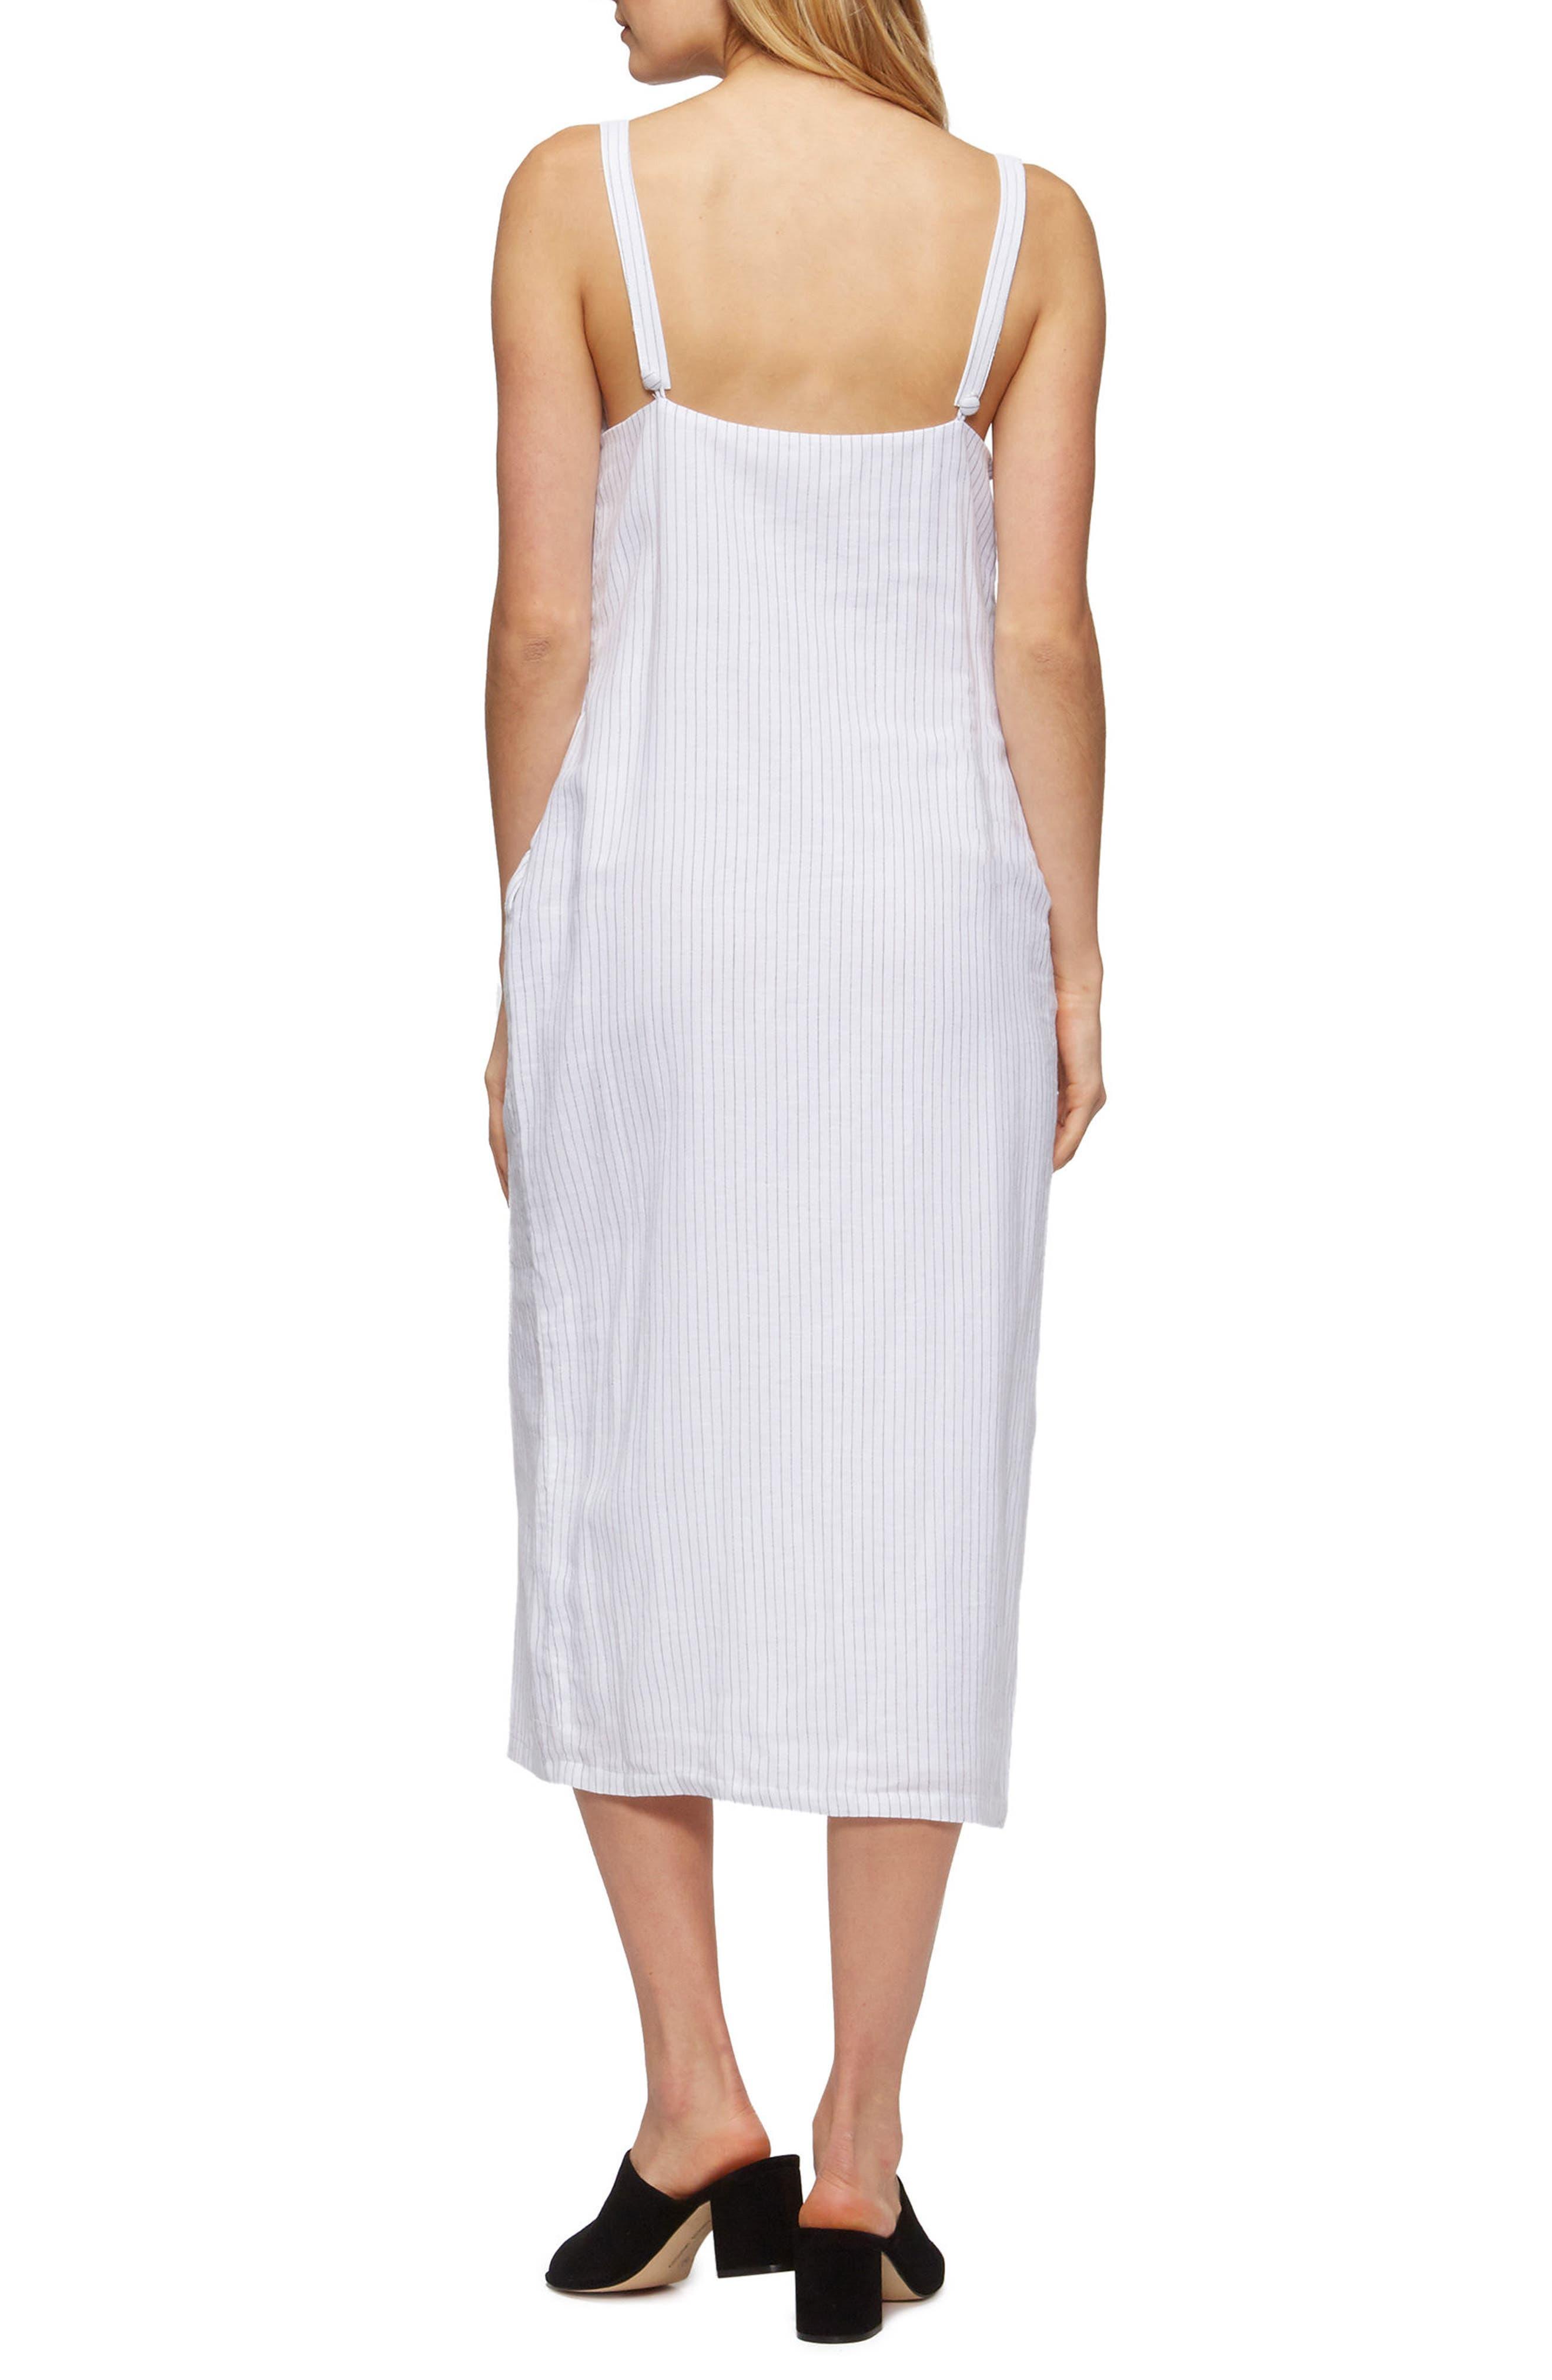 Tara Cover-Up Dress,                             Alternate thumbnail 2, color,                             Black Pinstripe